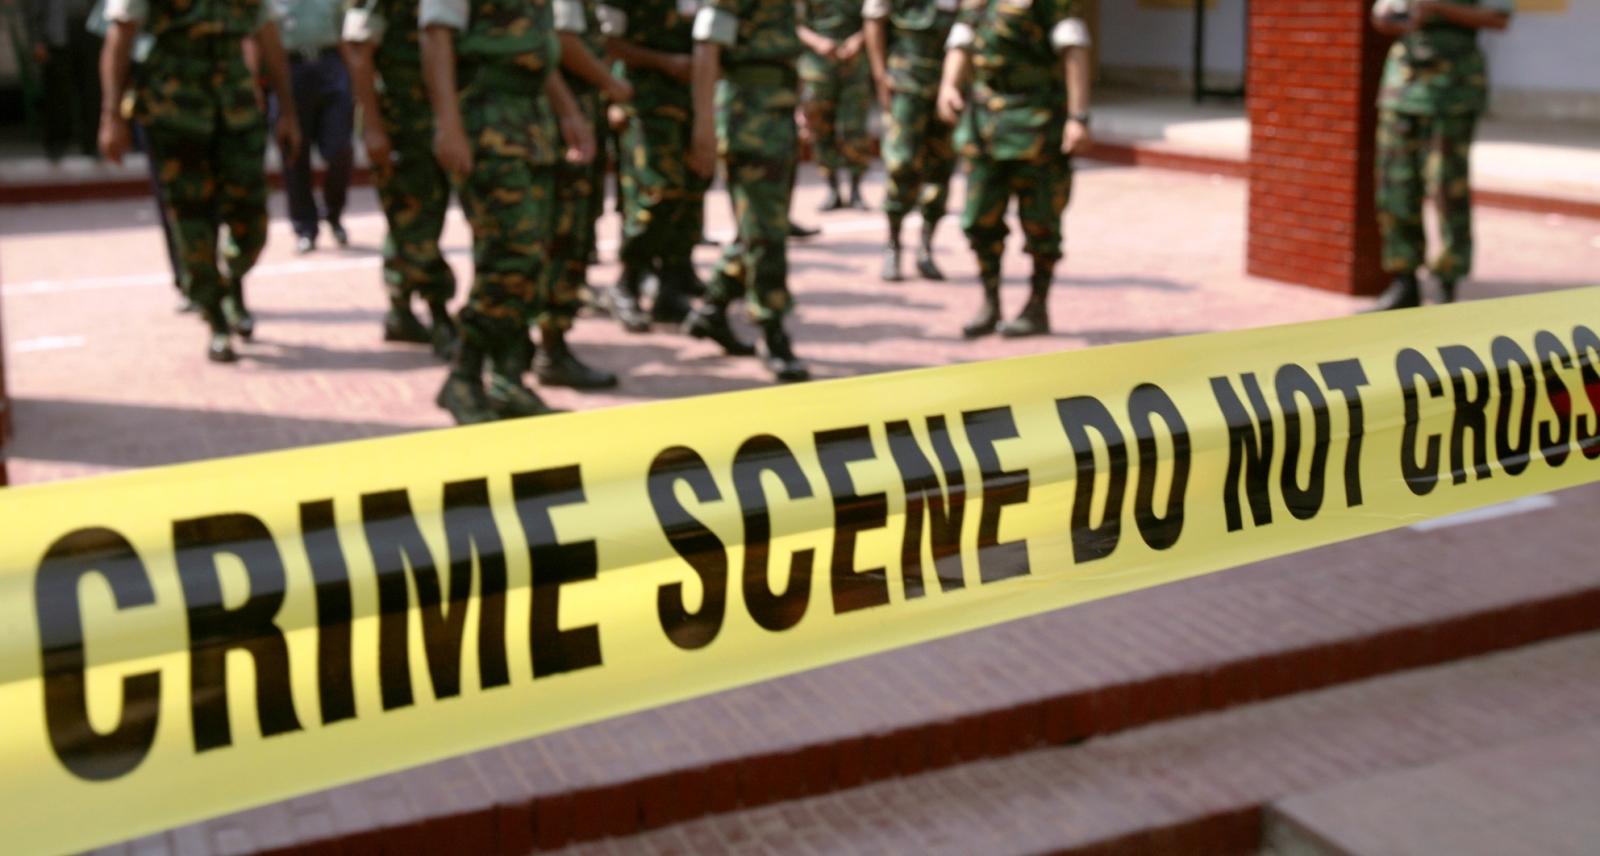 Bangladesh crime scene